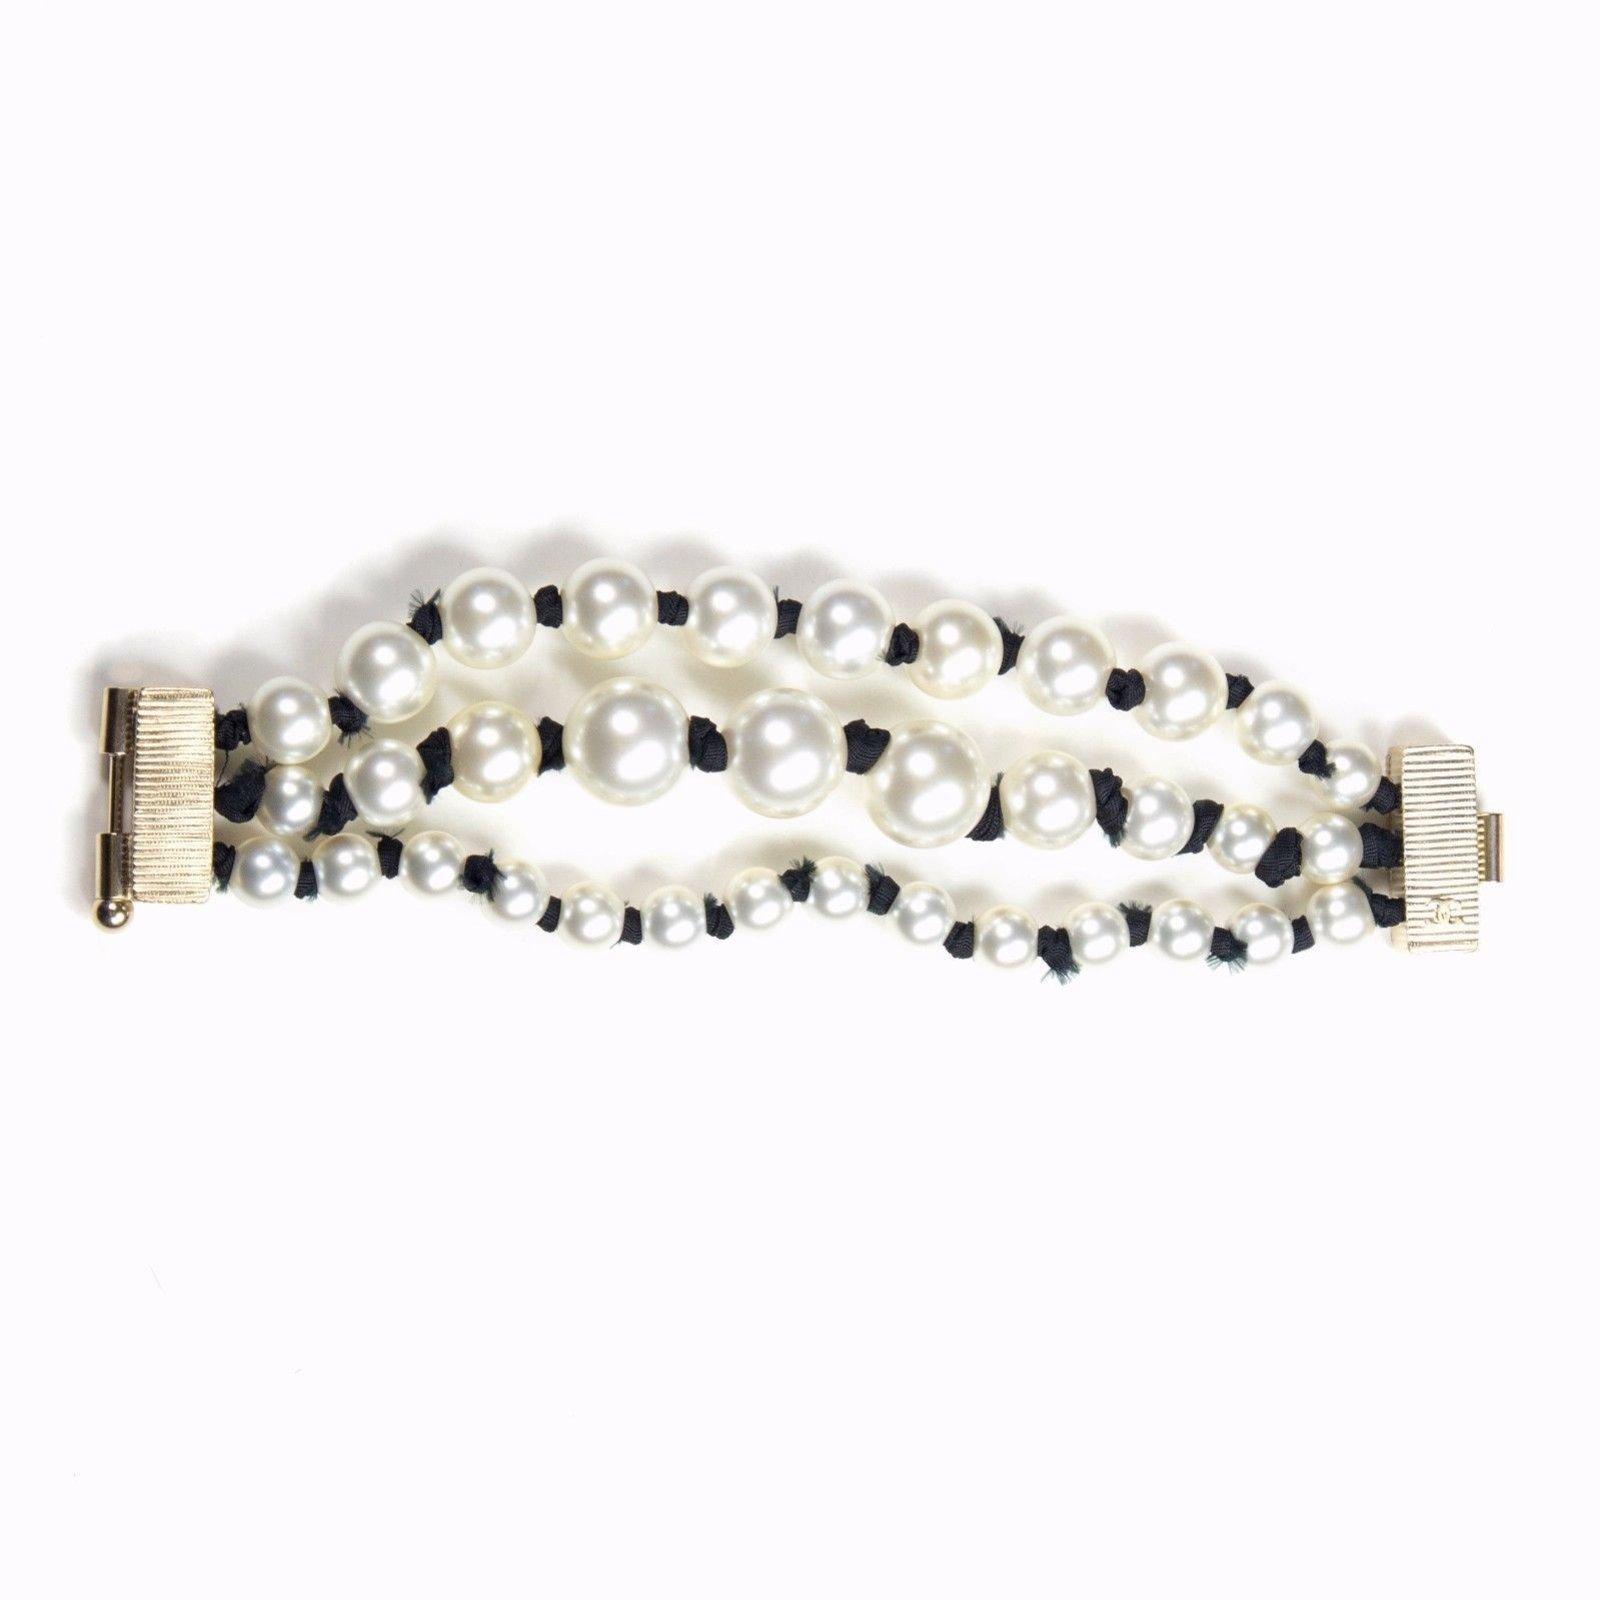 bracelets chanel 2016 bracelet perle triple rang perle blanc joli closet. Black Bedroom Furniture Sets. Home Design Ideas